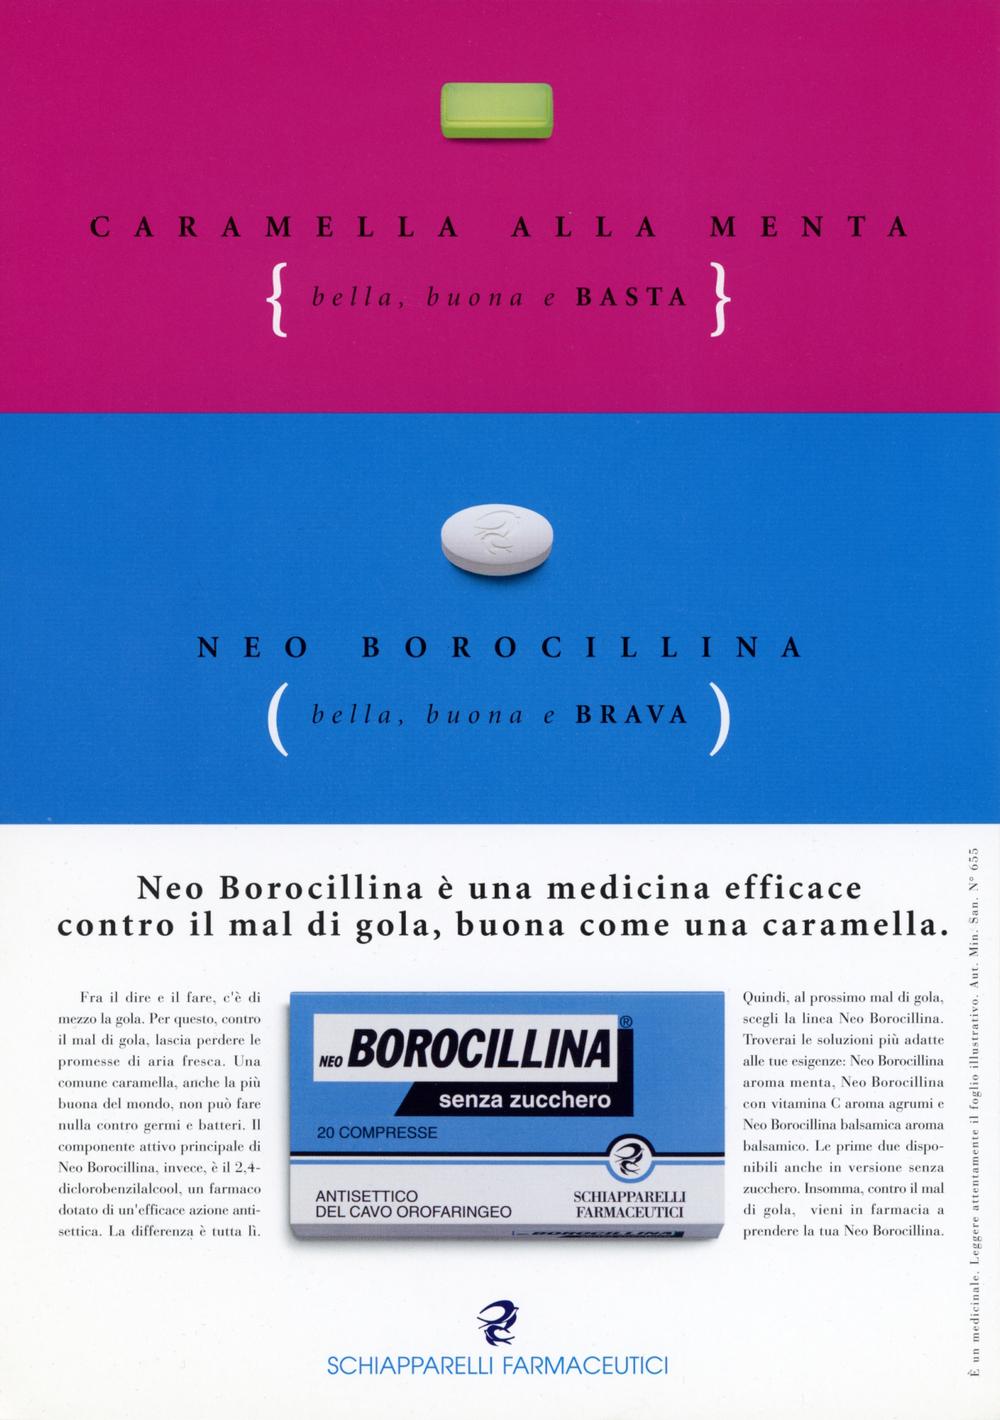 neoborocillina 1.jpg